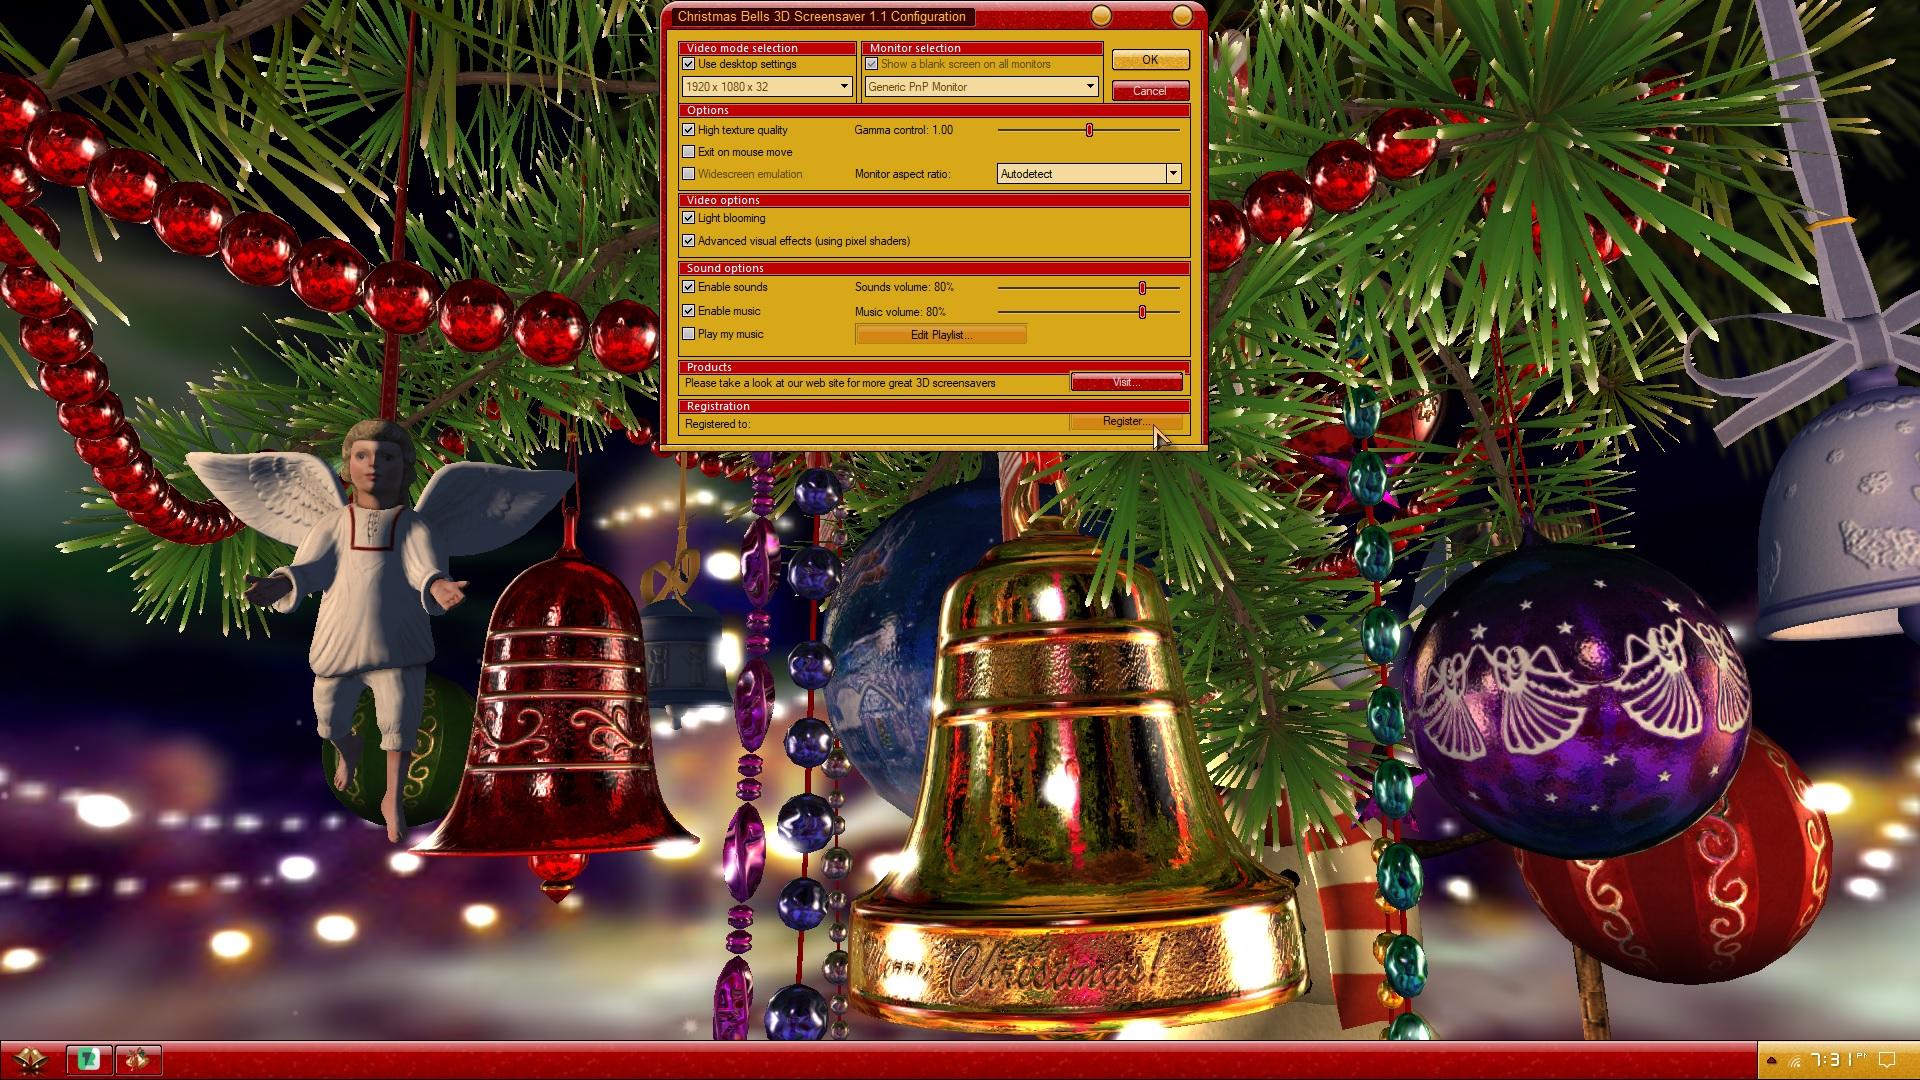 Direct Christmas Bells Screensaver Animated Wallpaper